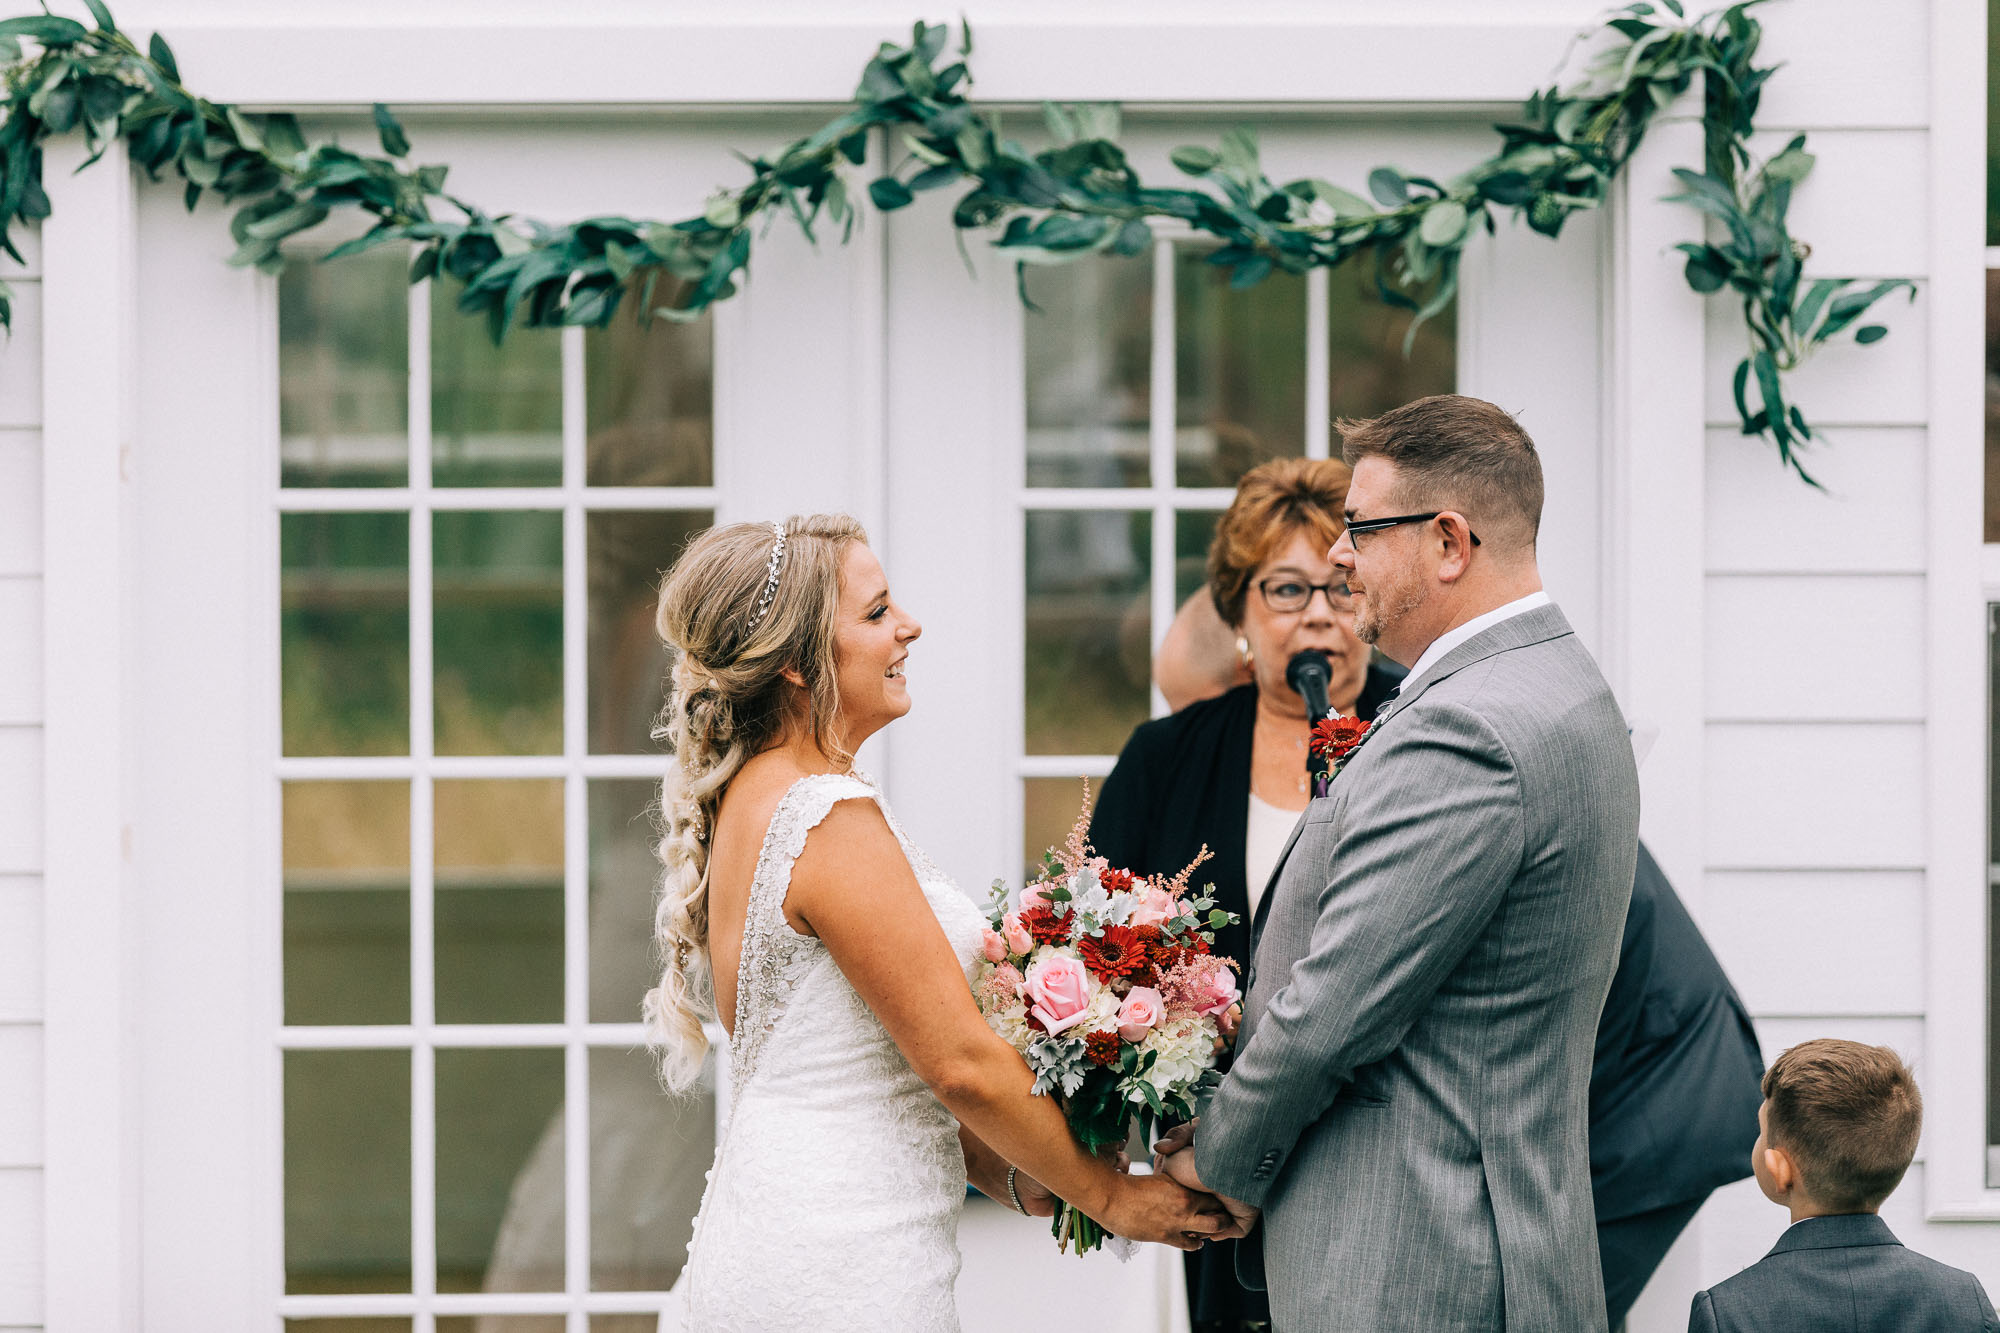 Lodge-at-Raven-Creek-October-wedding-25.jpg